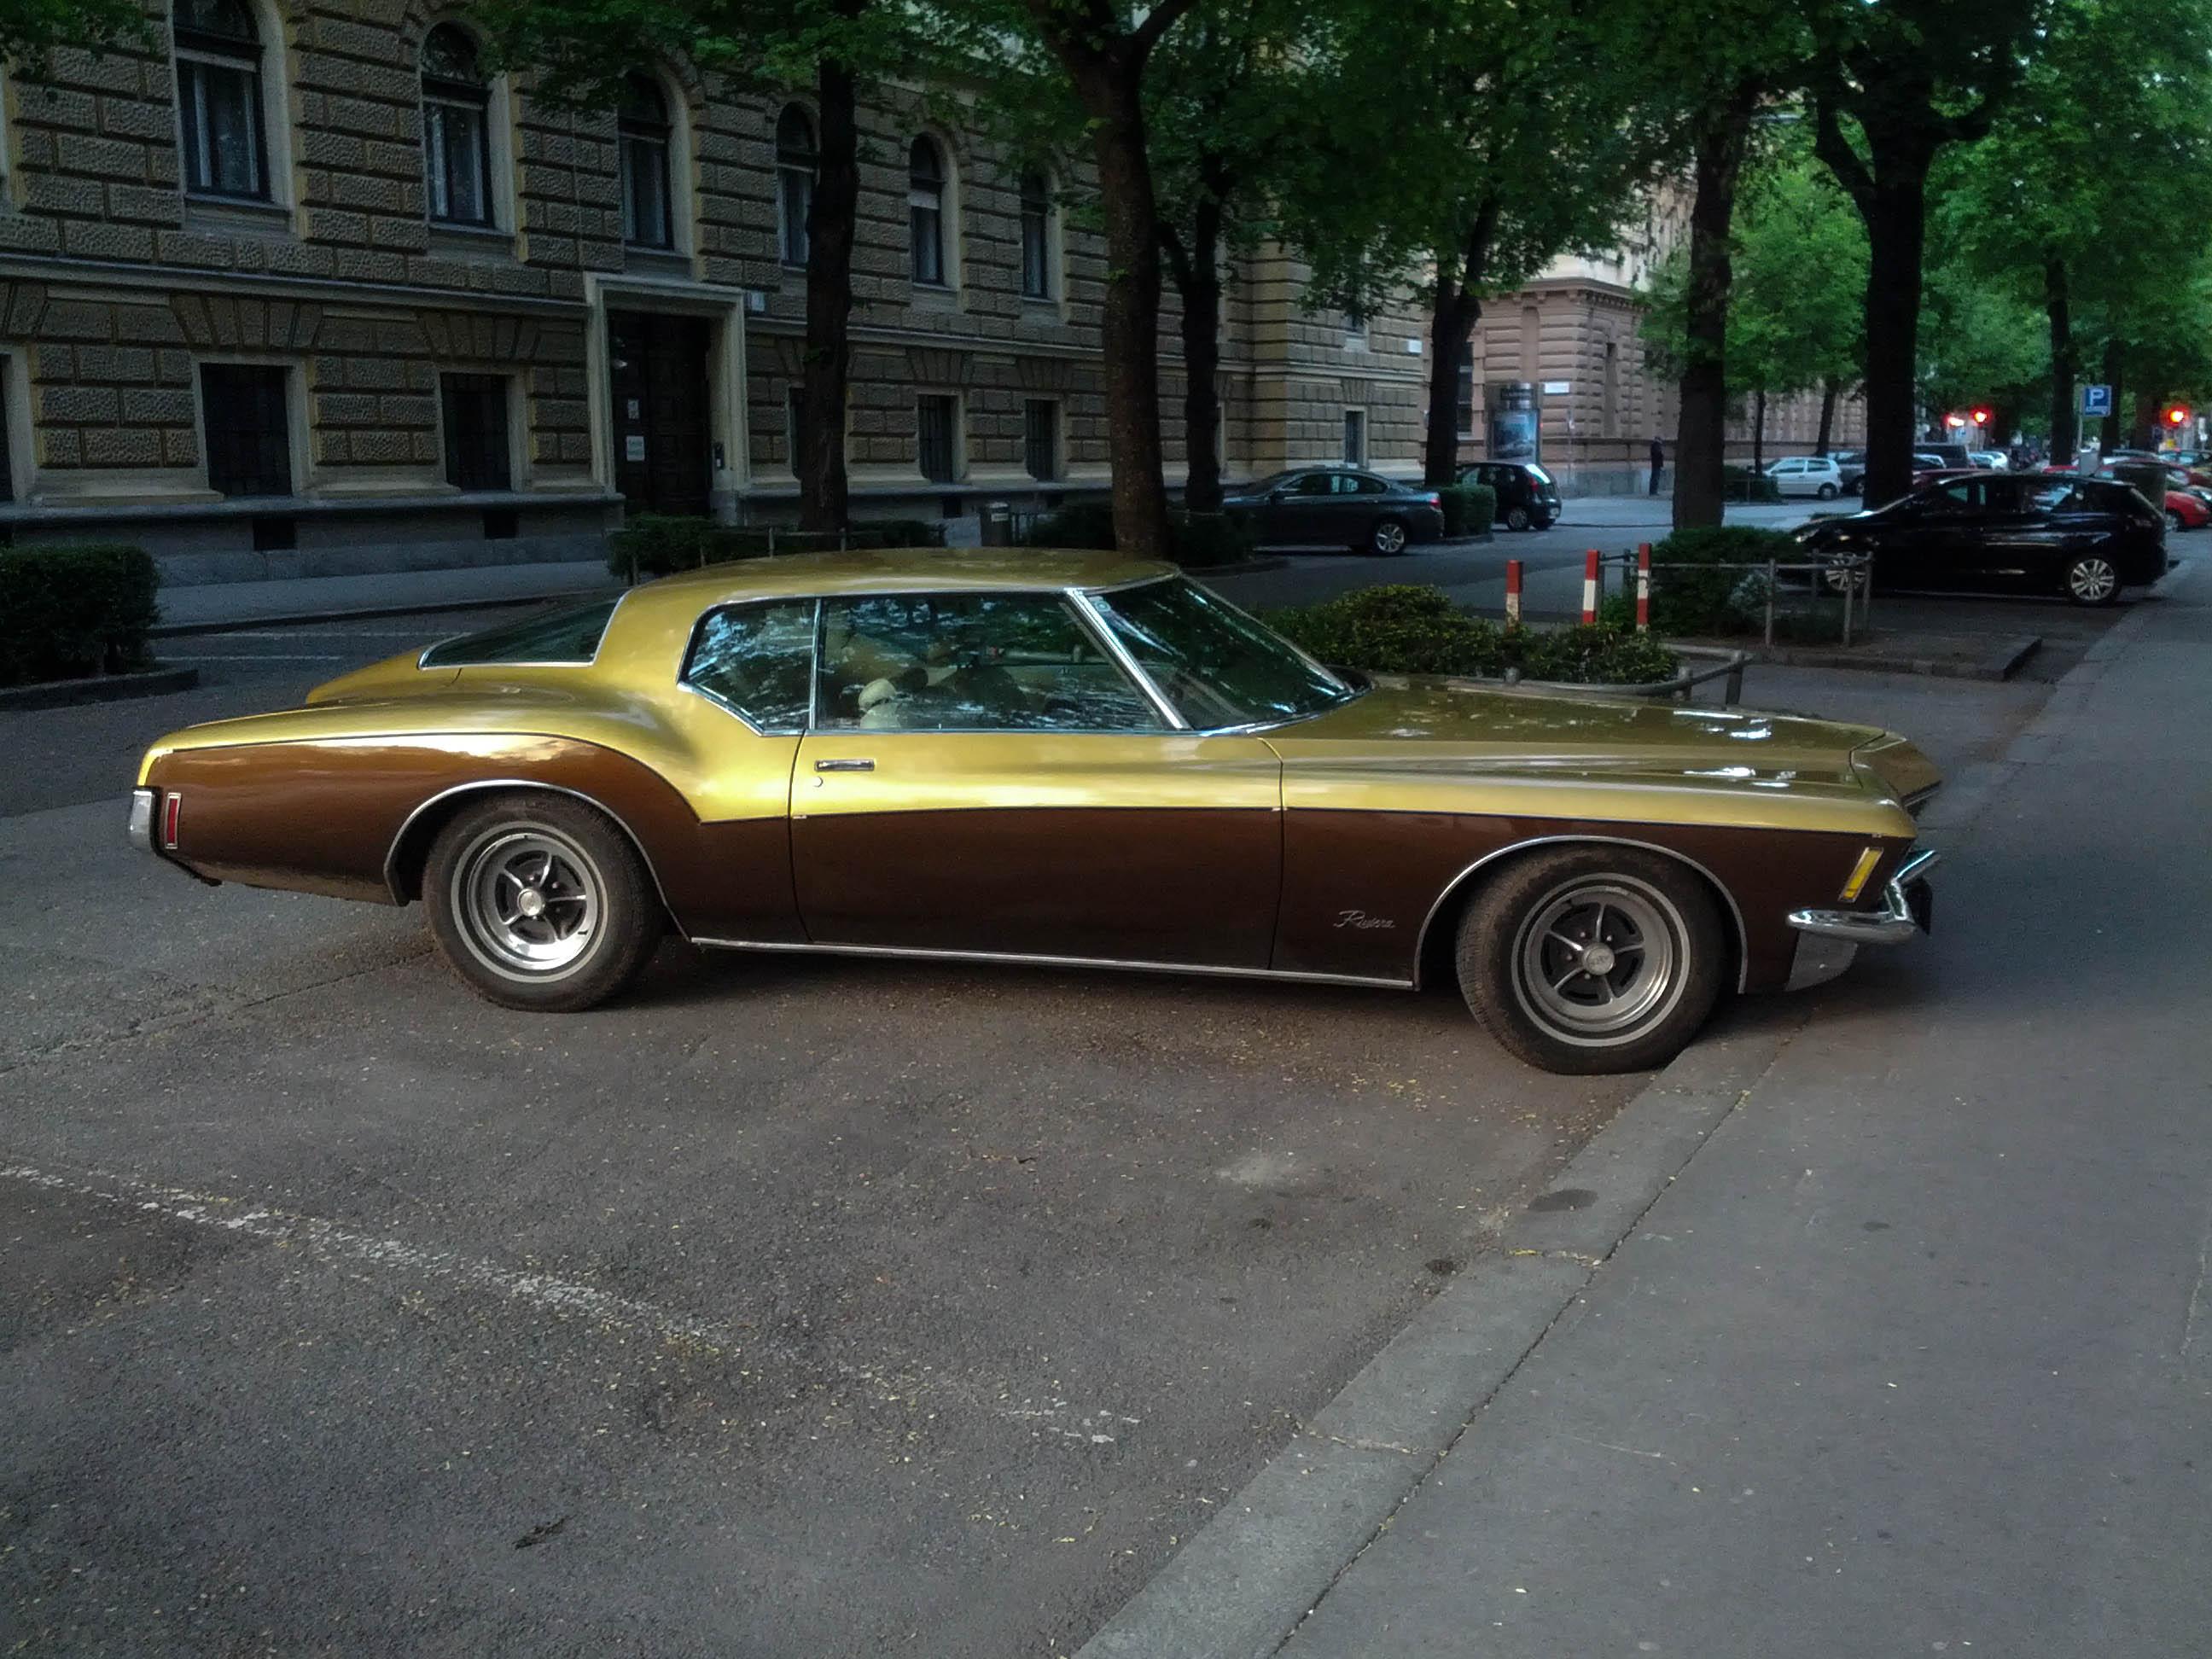 buick riviera coupe goldbraun graz - Ein sportliches goldbraunes Buick Riviera Coupé